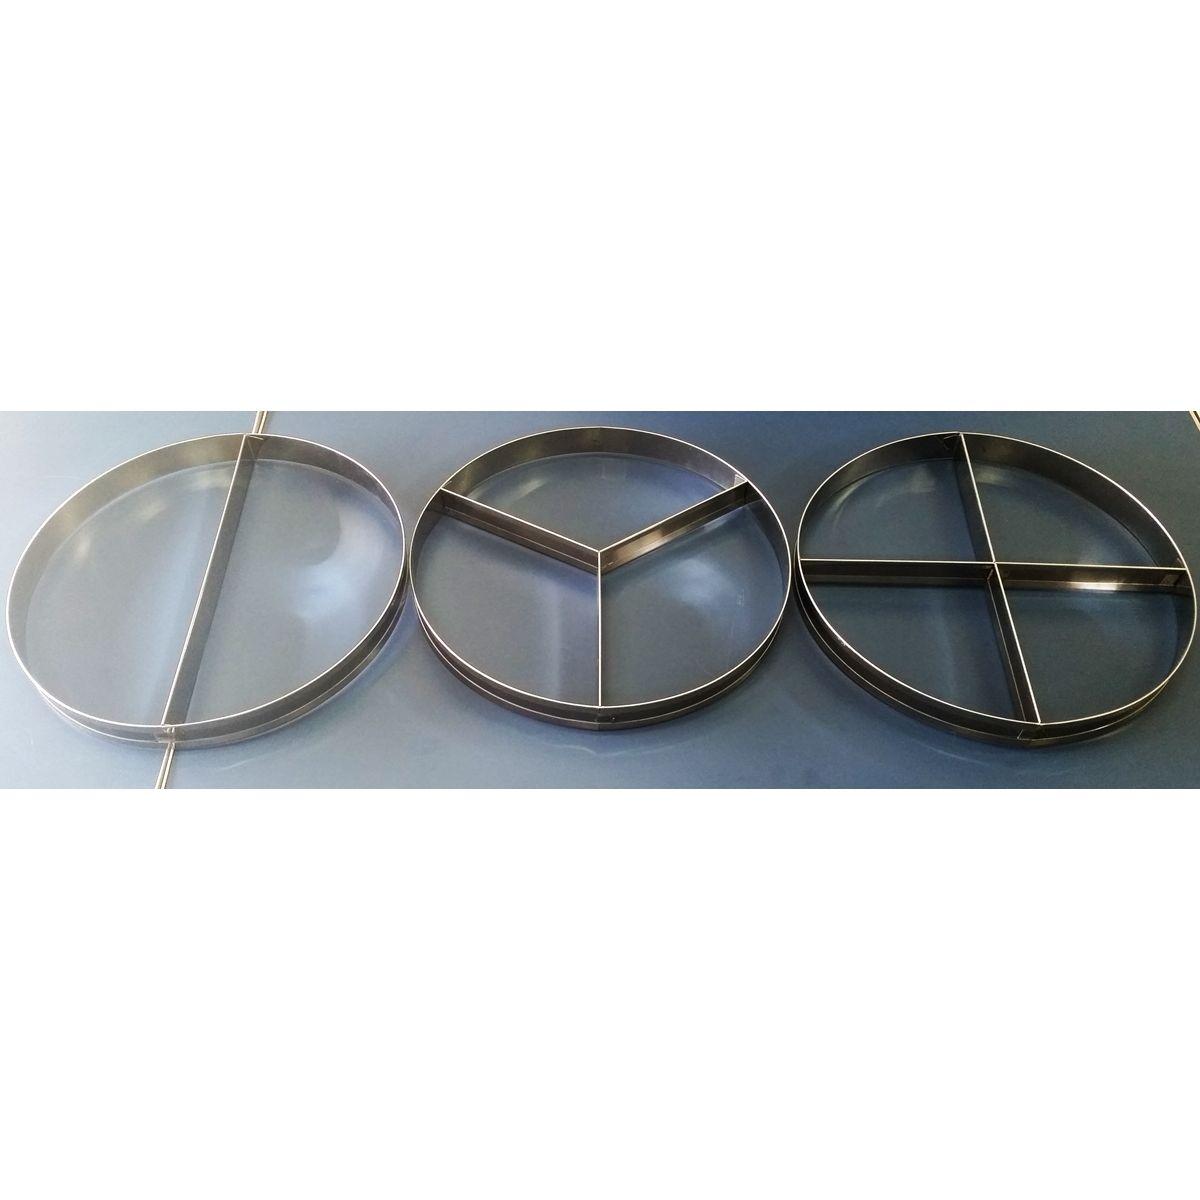 APARTADORES - 2, 3 e 4 SABORES INOX. P/PIZZAS DE 35 CM  - Fórum de Pizzas Vendas online